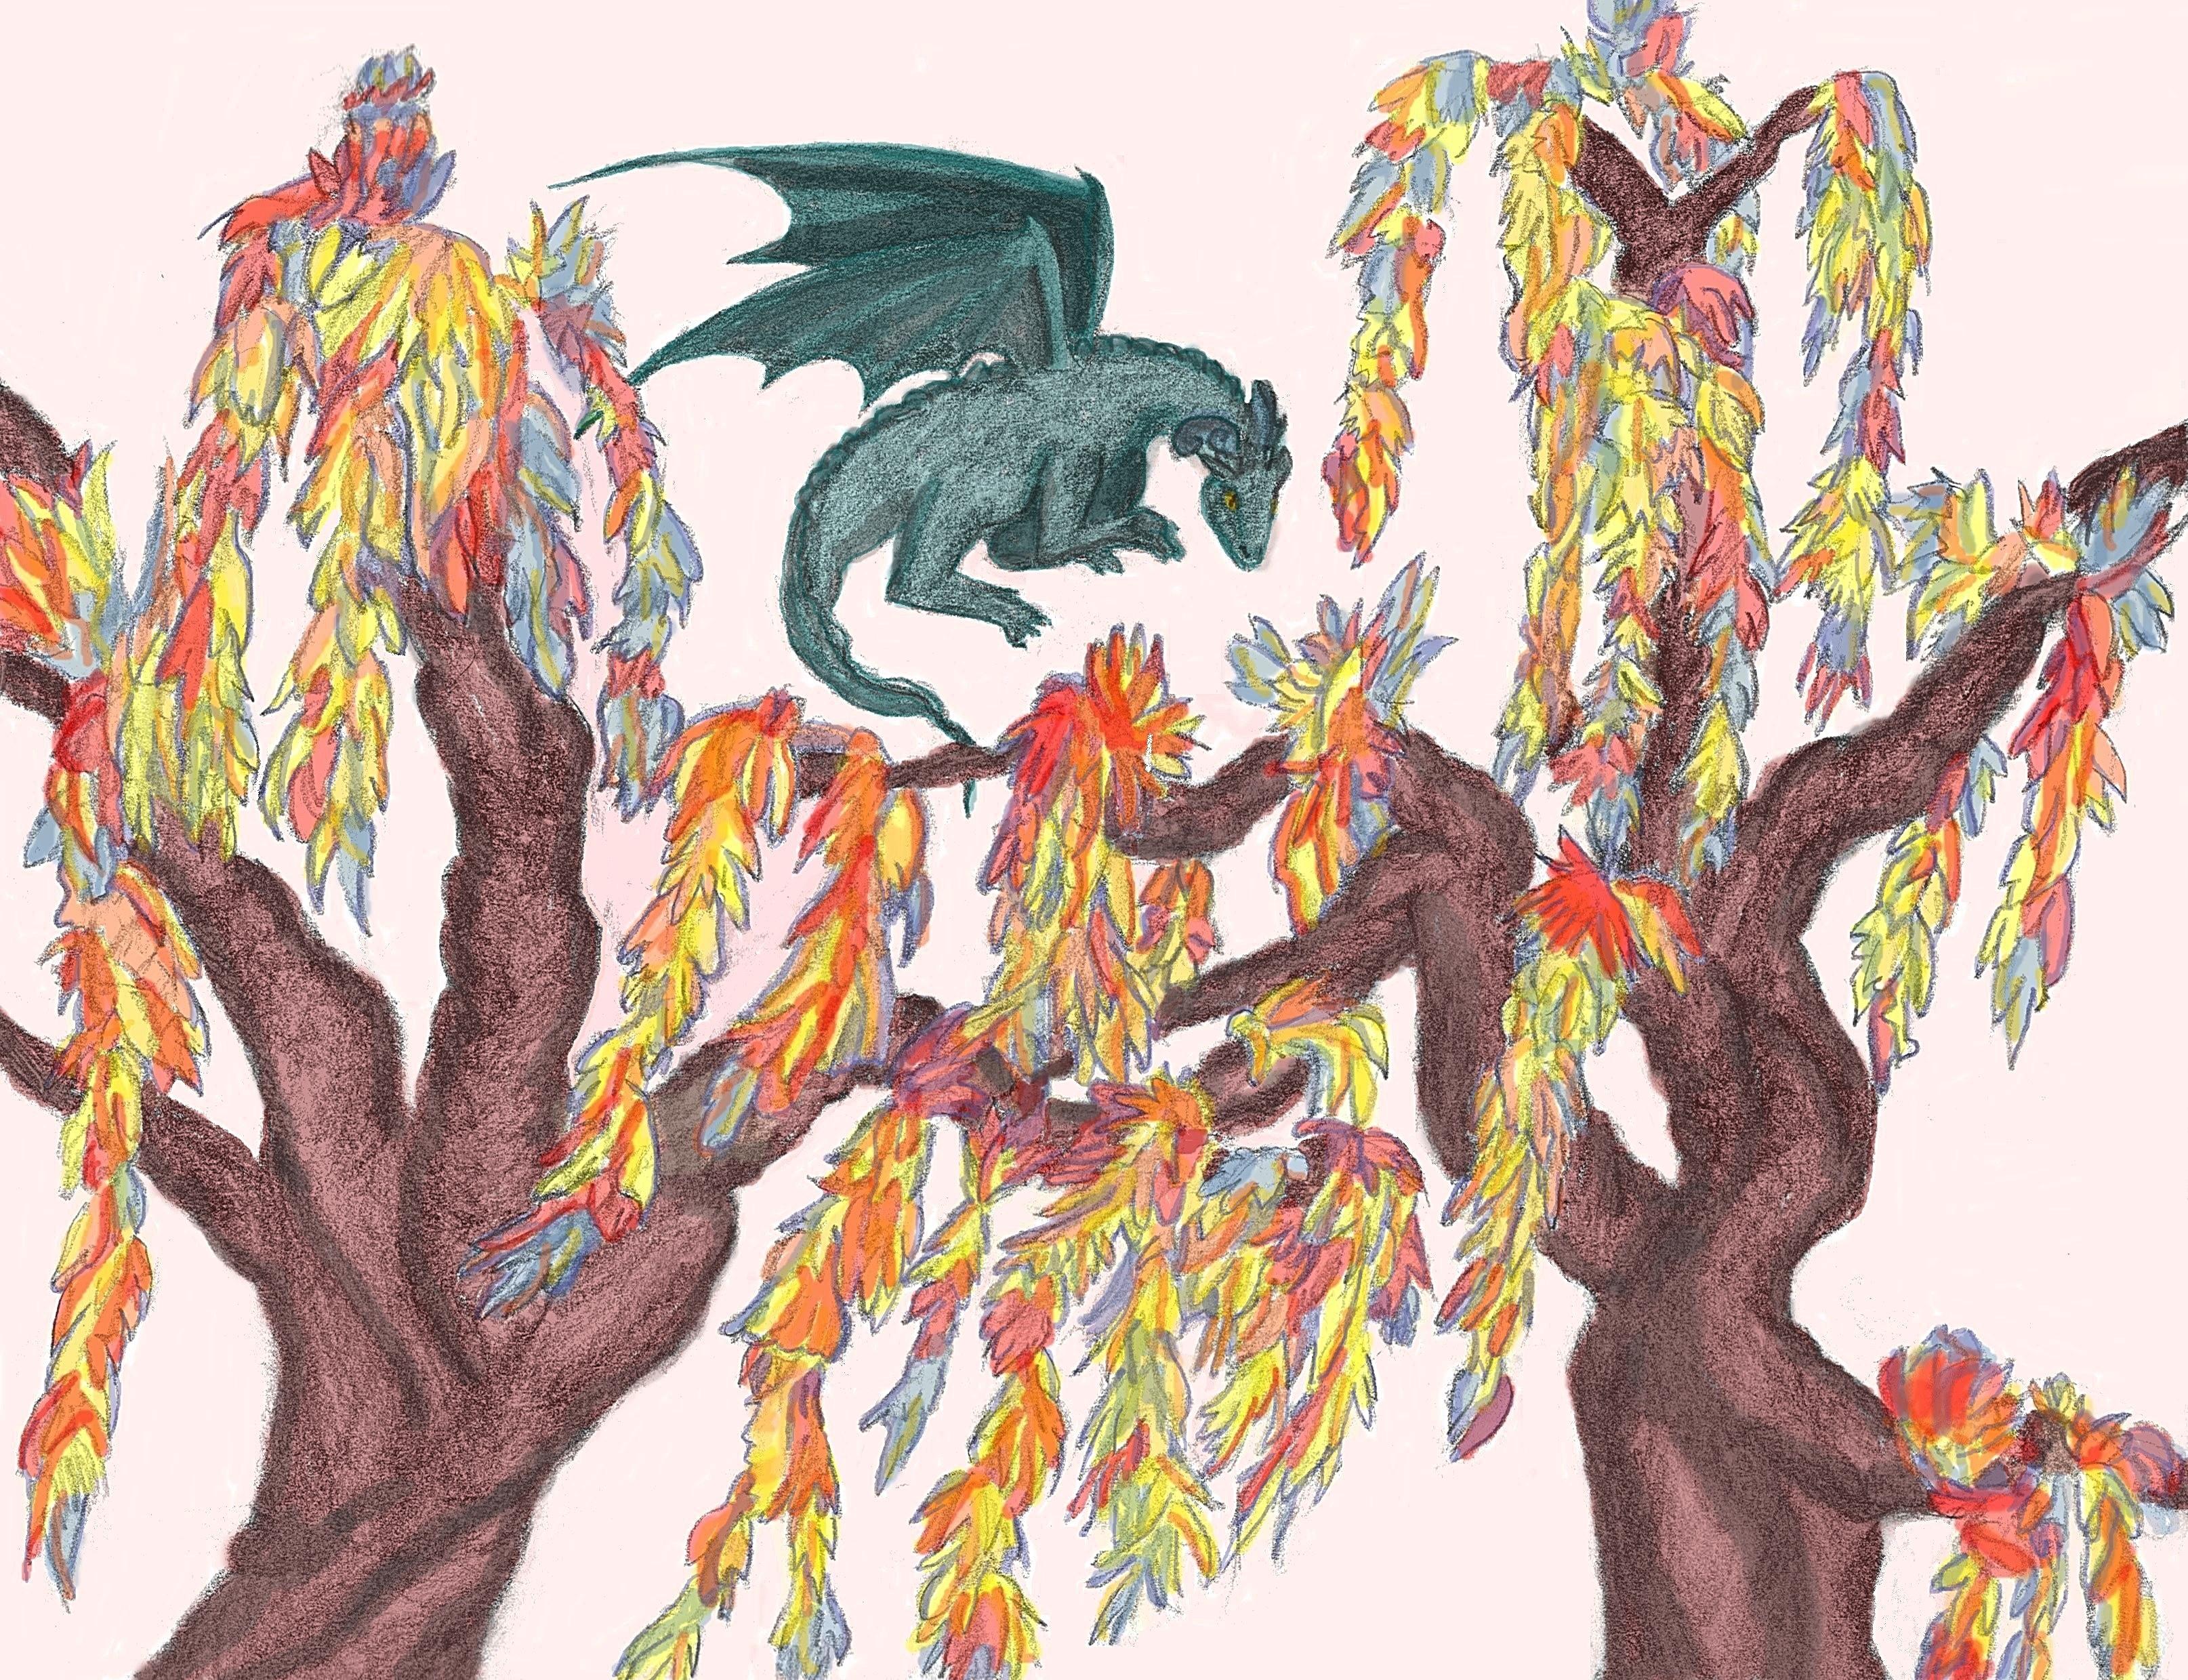 18. Dragon in Extrordinarium color.0 amended background